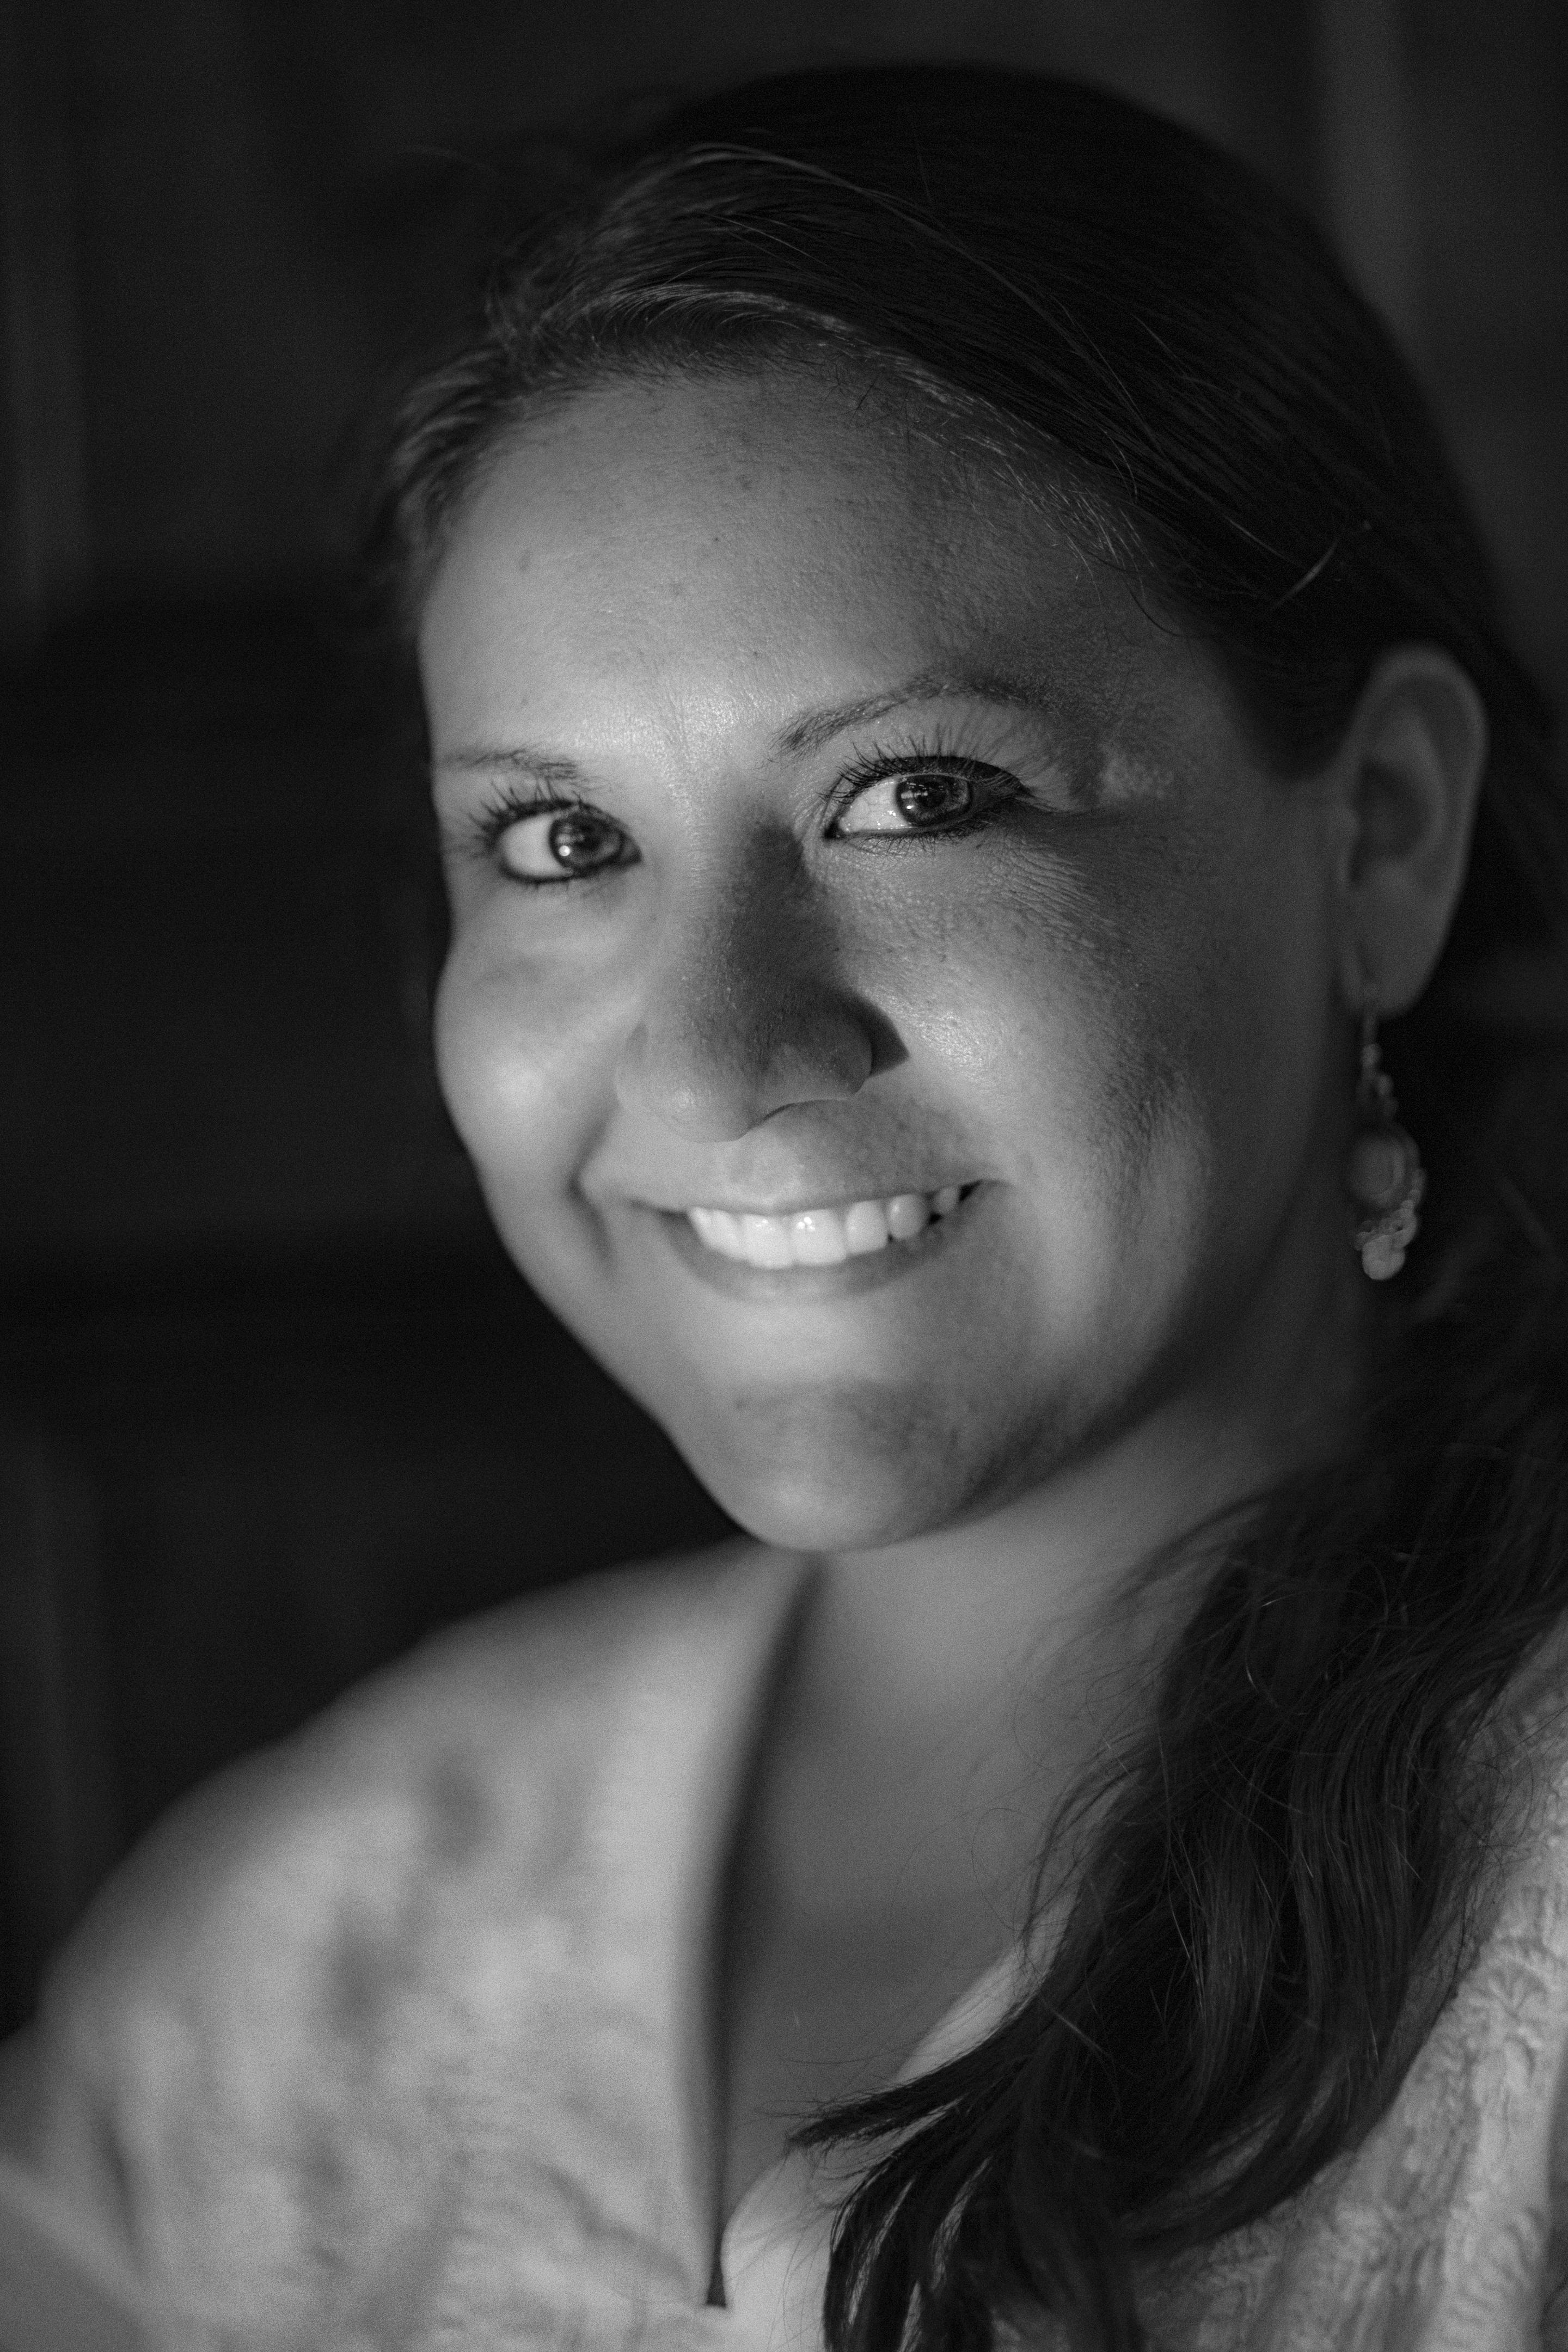 Denisse Velazquez - México